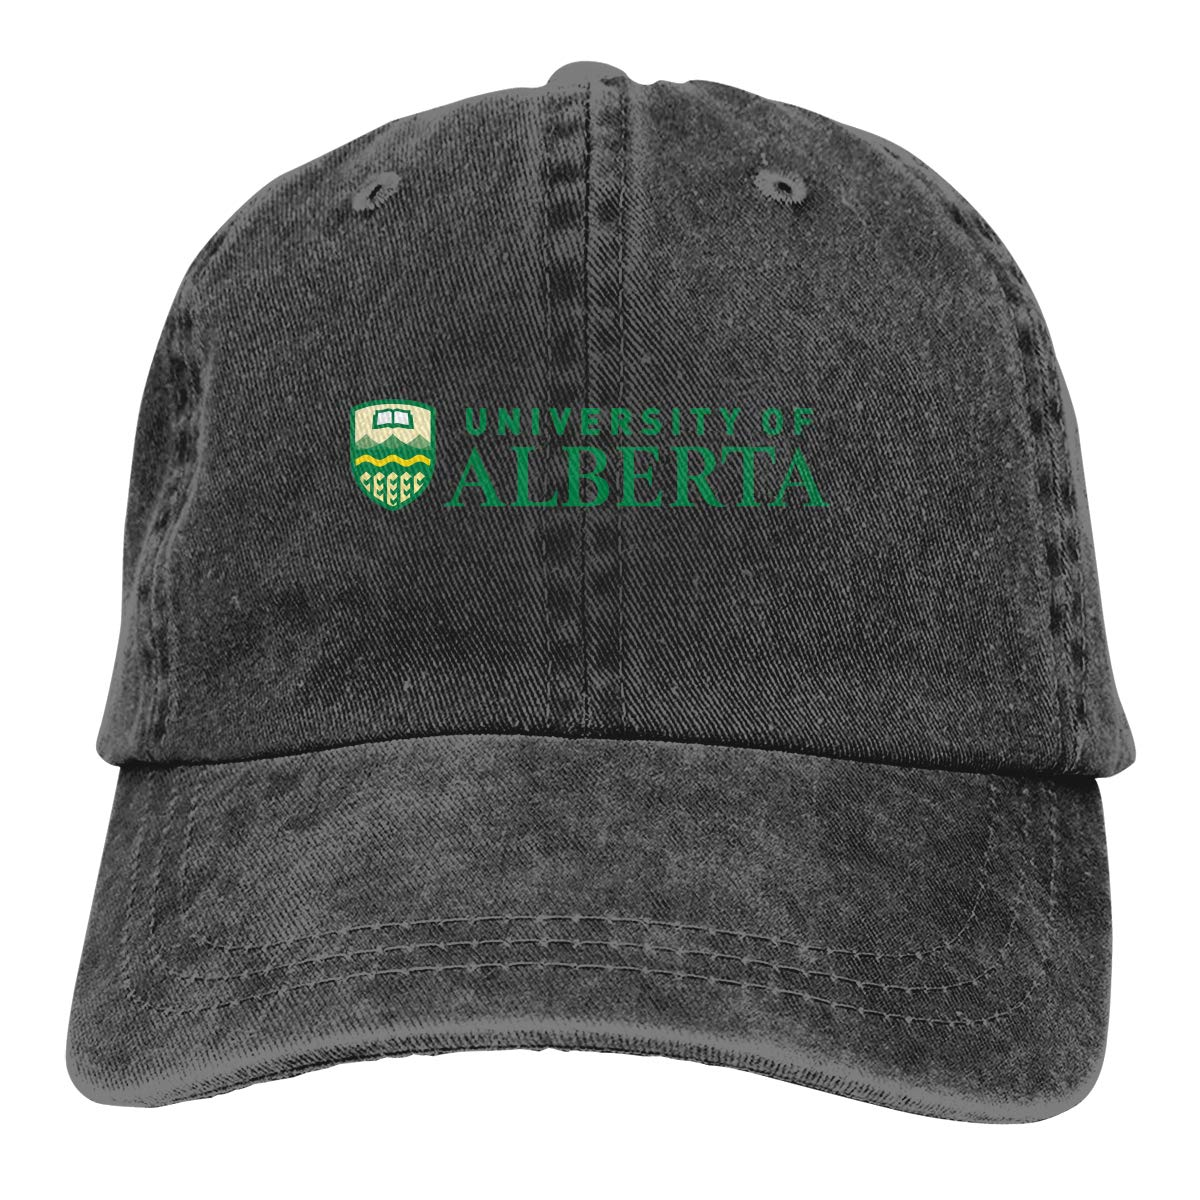 Usoasumusy University of Alberta Adult Baseball Cowboy Hats Caps